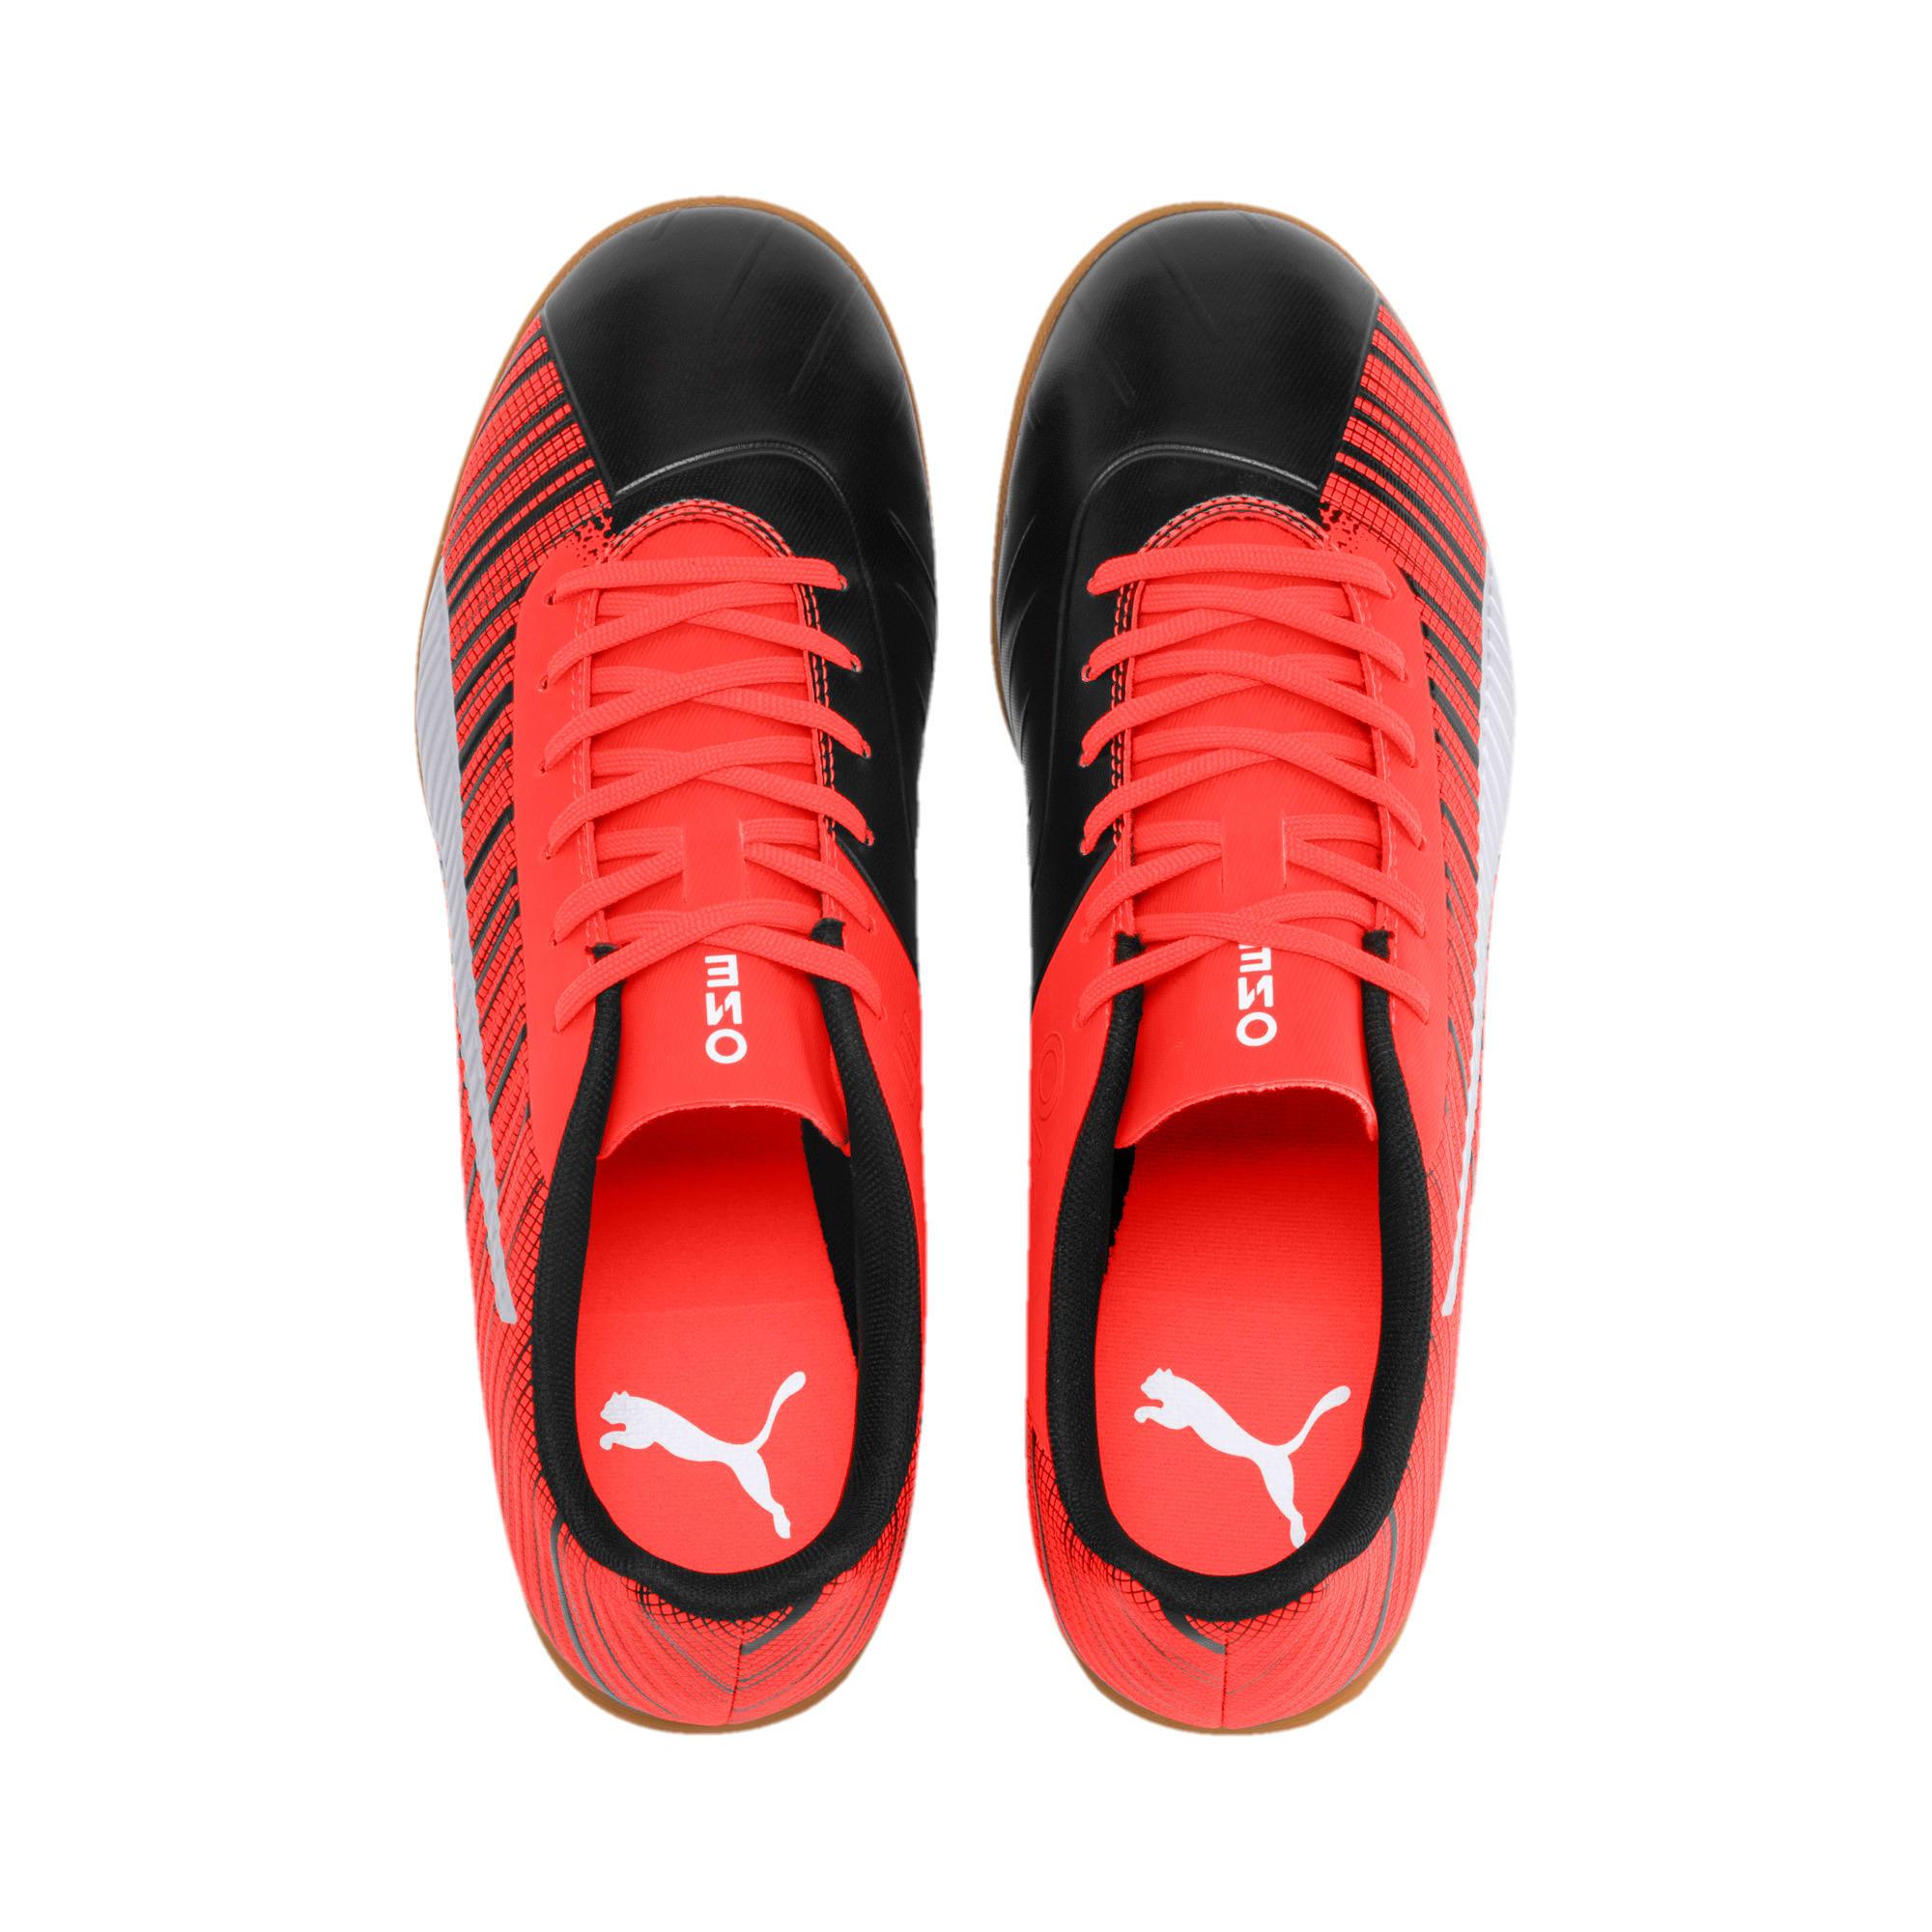 Thumbnail 7 of PUMA ONE 5.4 IT Men's Soccer Shoes, Black-Red-Silver-Gum, medium